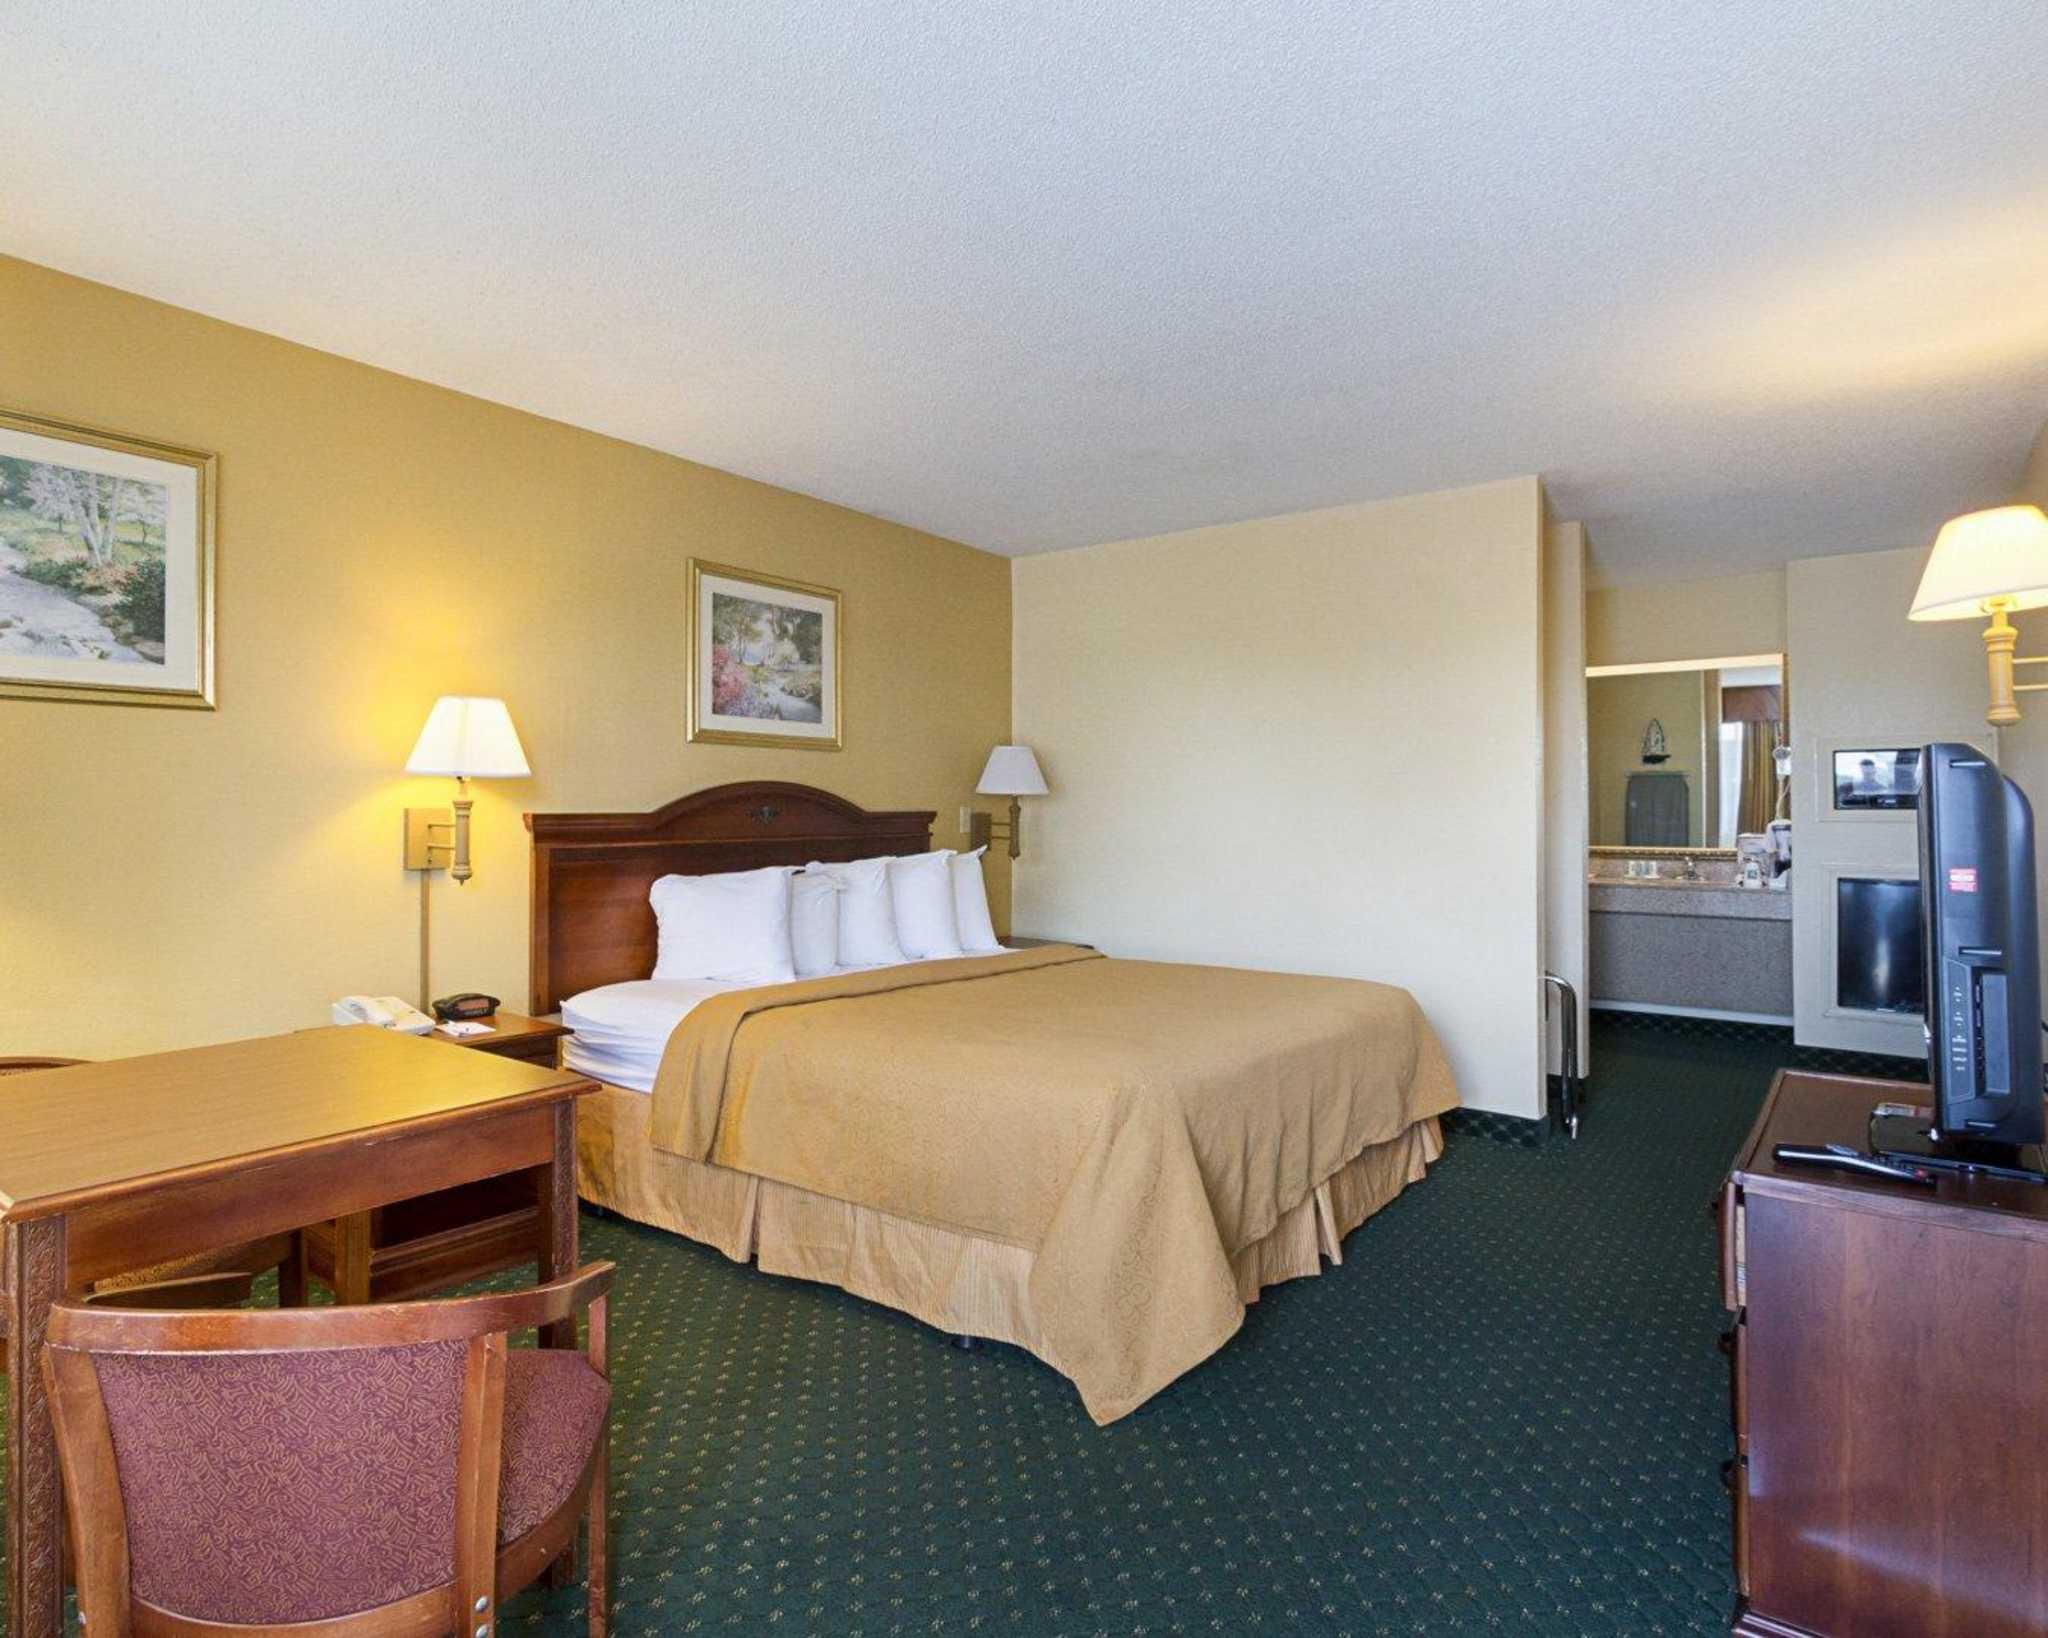 Quality Inn & Suites Southwest image 13